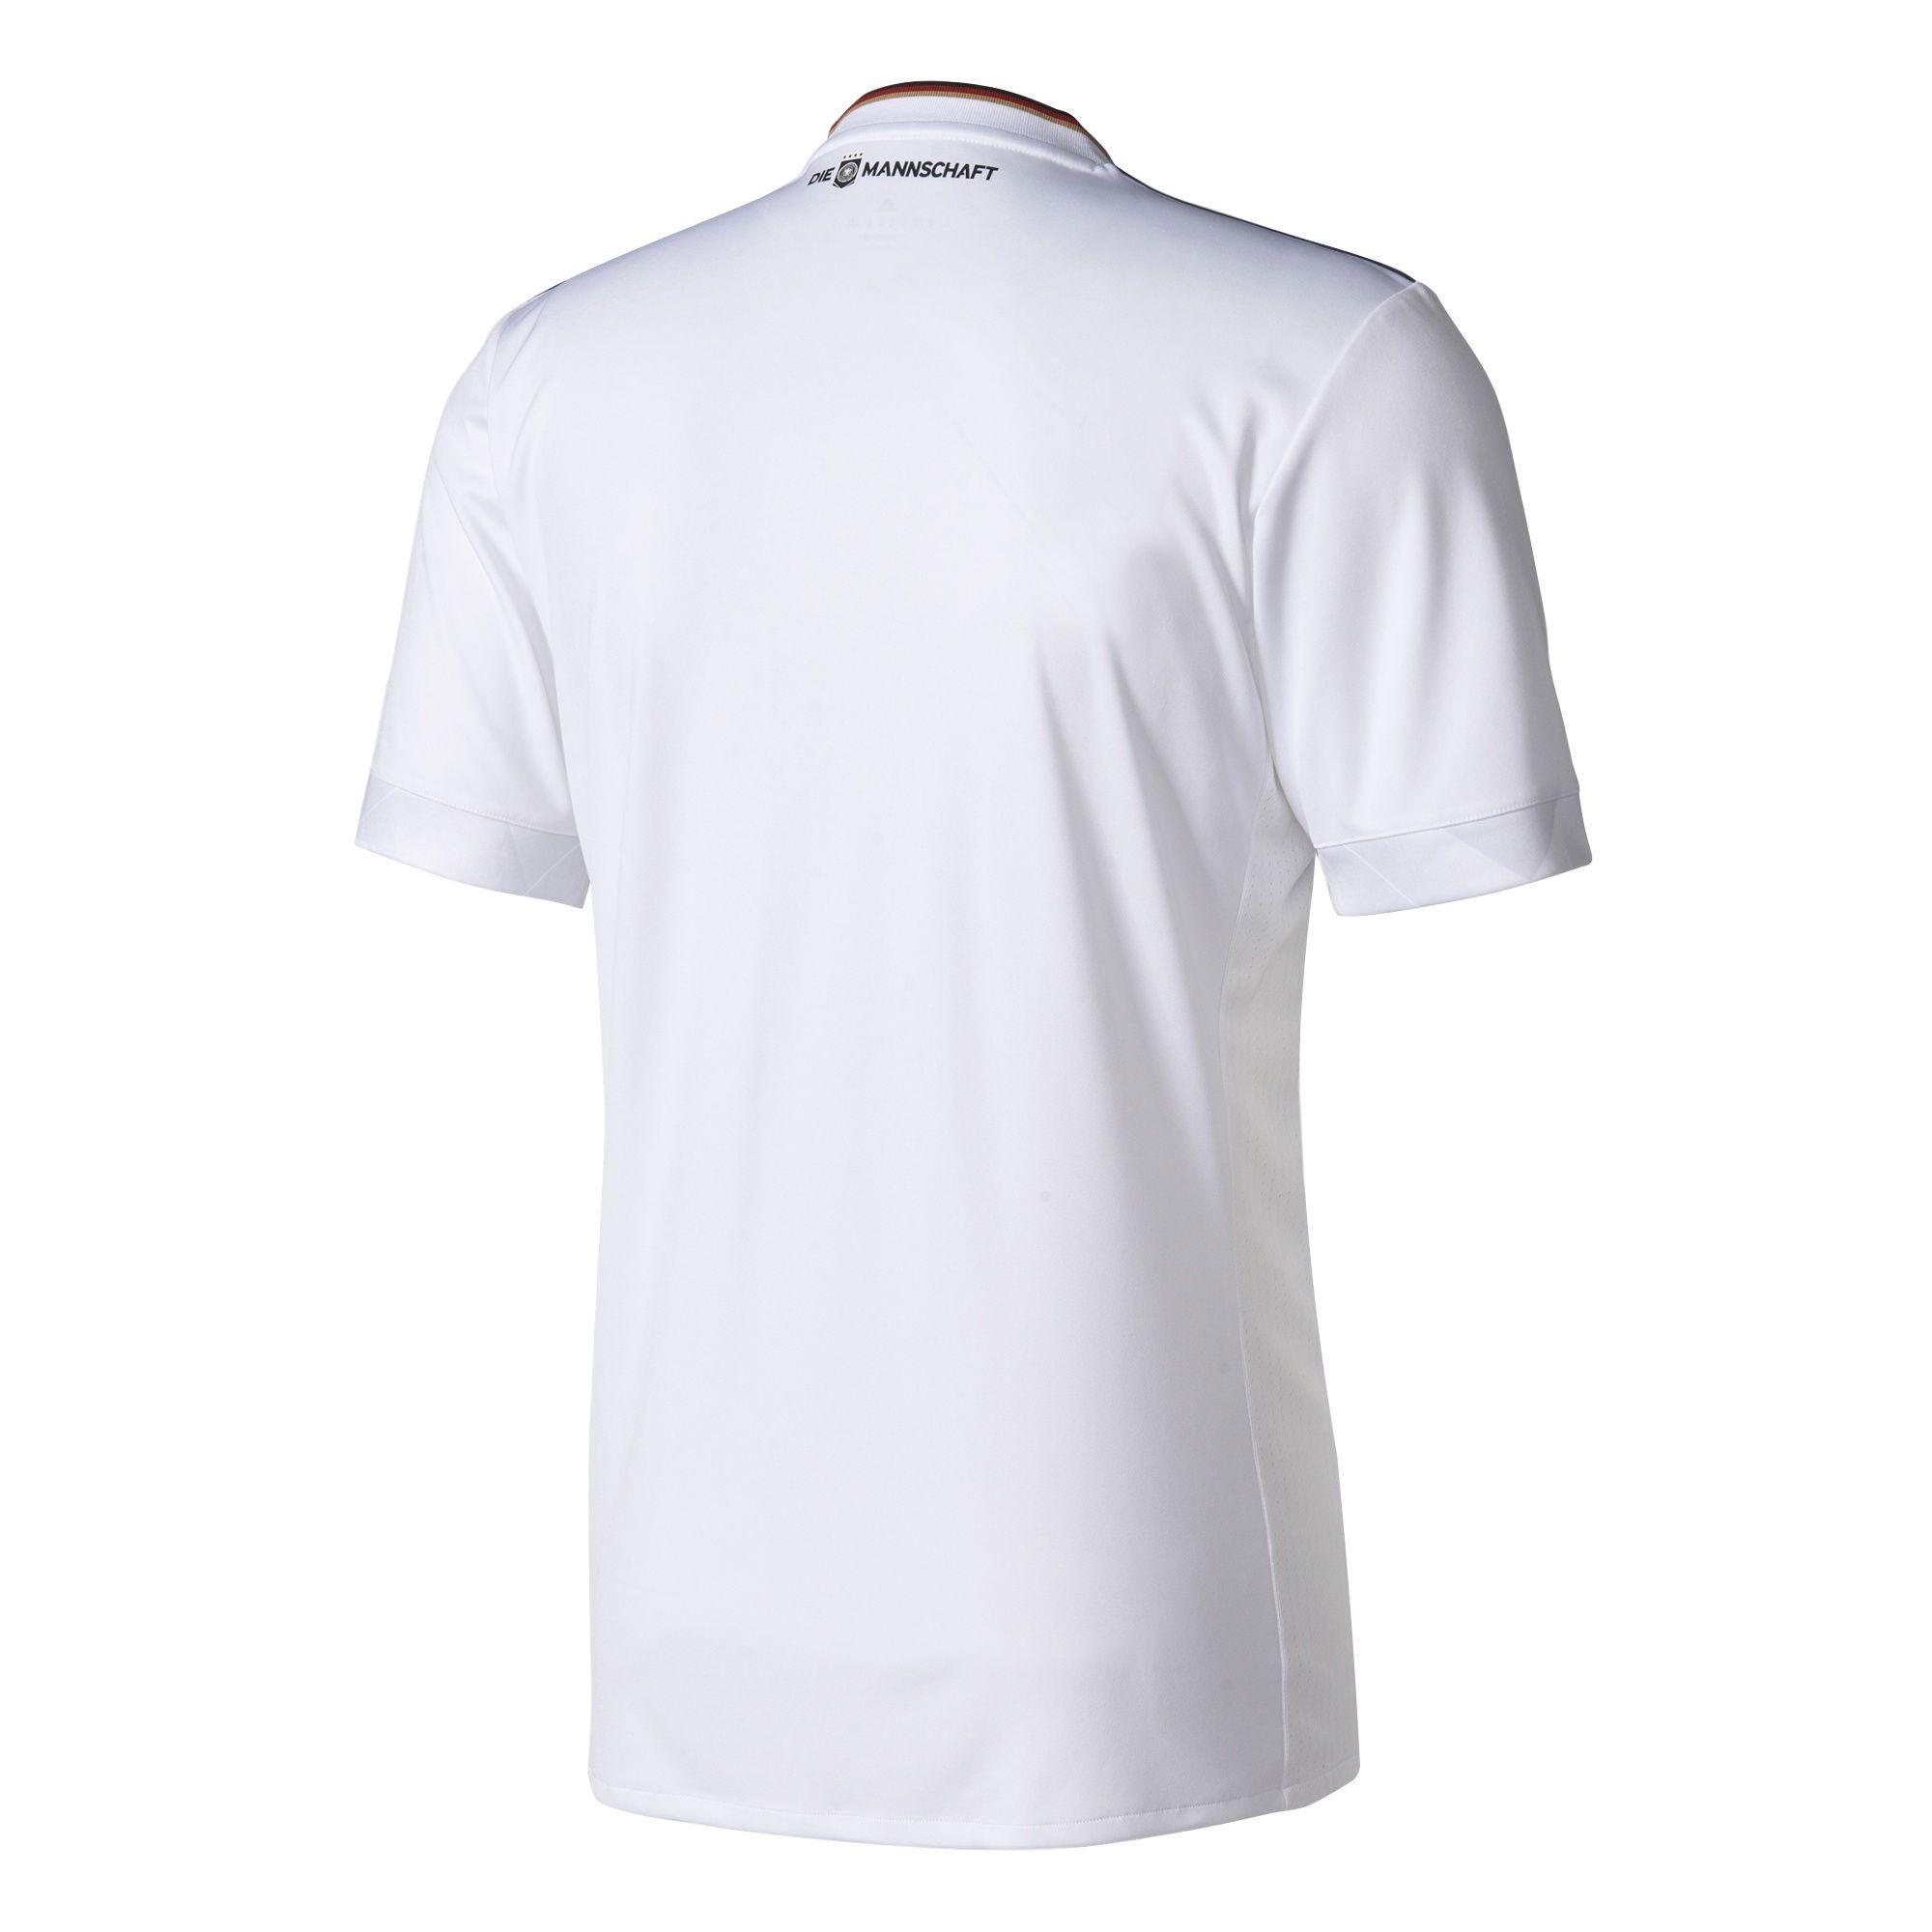 Camisa Adidas Alemanha